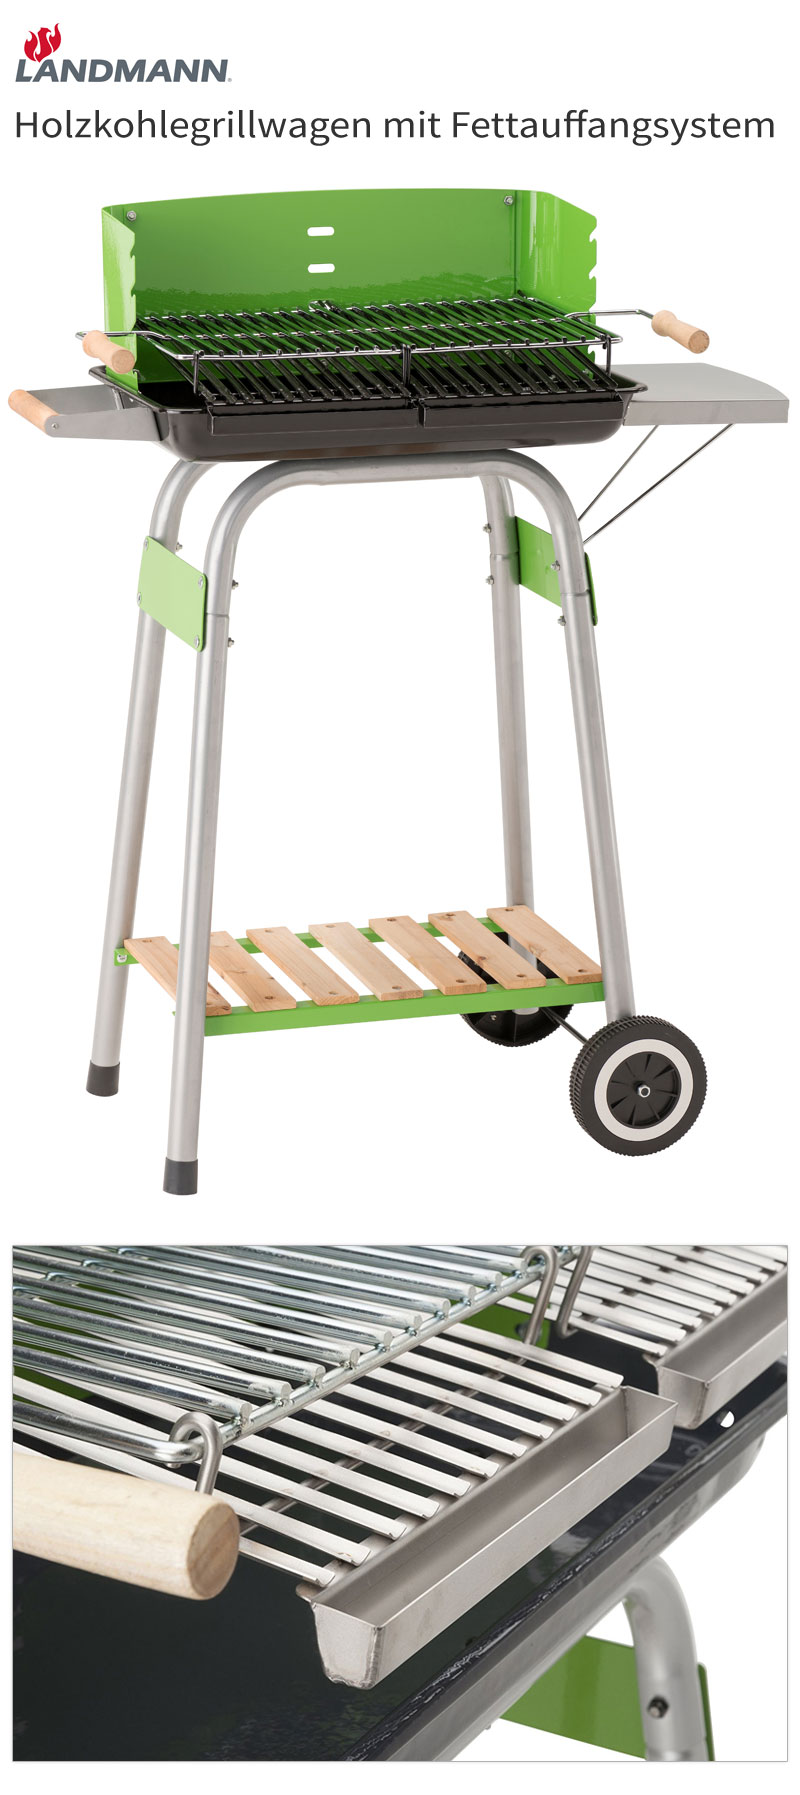 landmann holzkohlegrill mit fettauffangsystem grillwagen. Black Bedroom Furniture Sets. Home Design Ideas